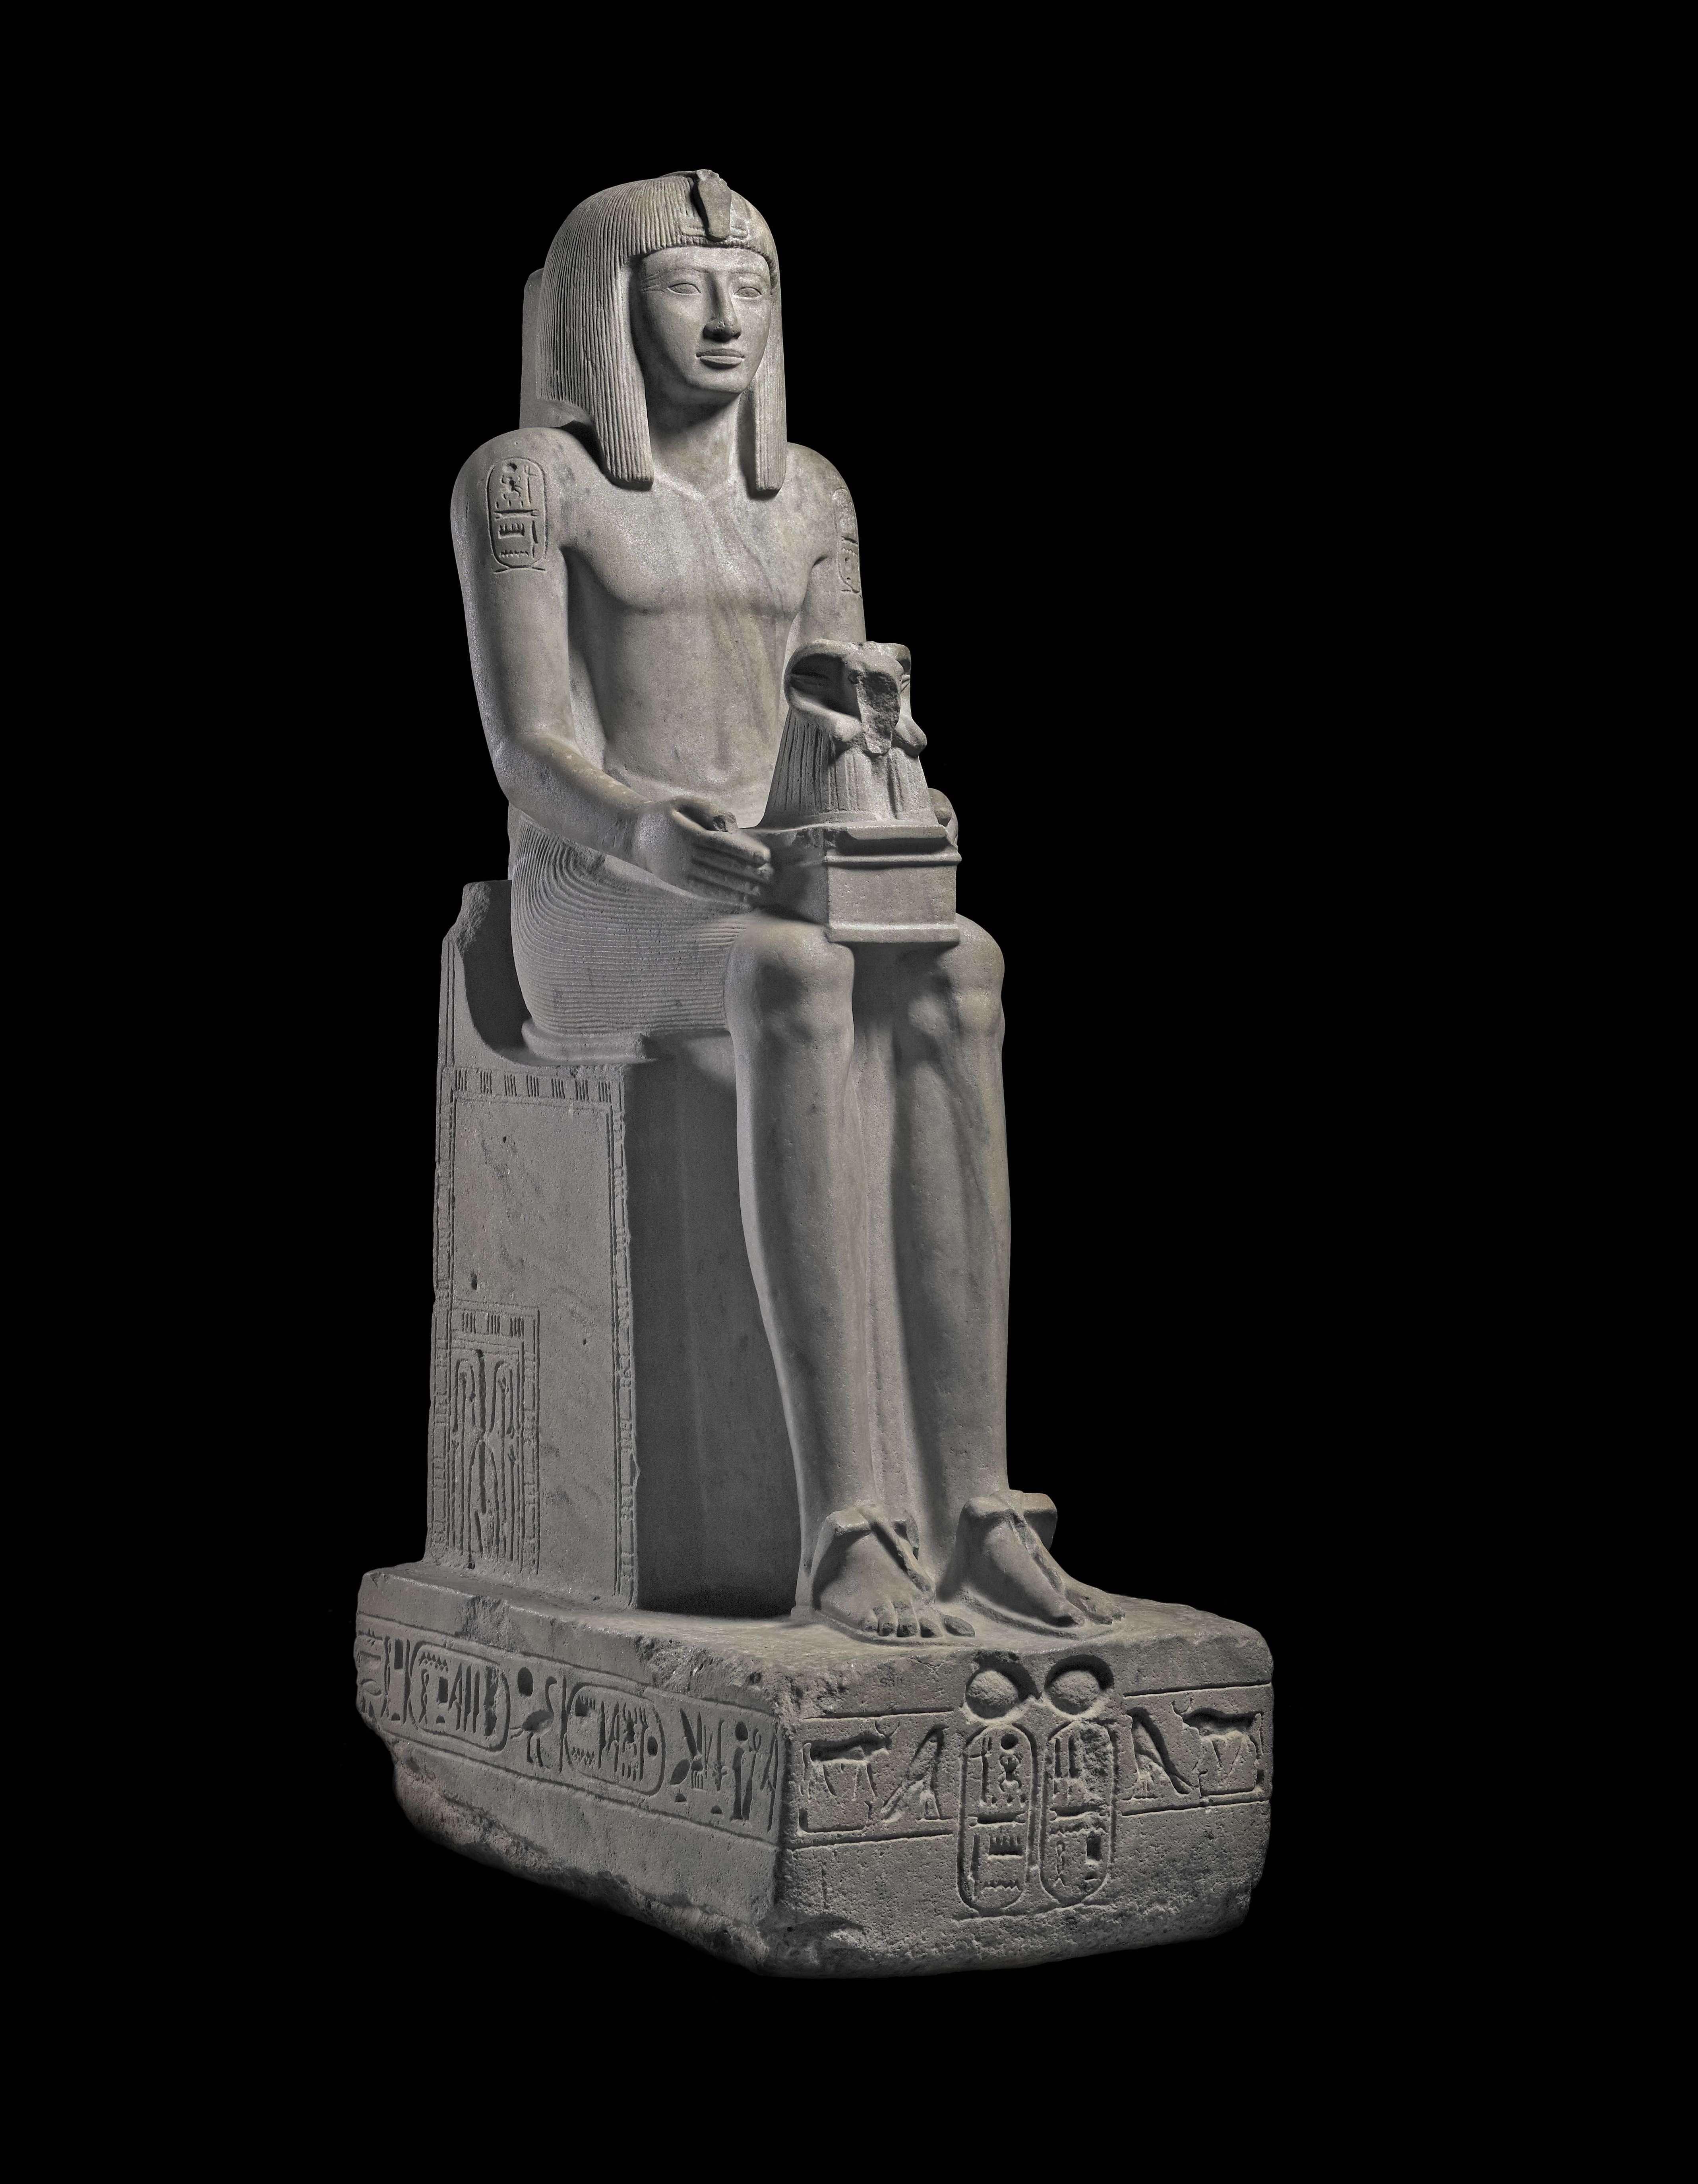 estatua-sedente-del-faraon-seti-arenisca-cuarcitica-dinastia-xix-reinado-de-seti-ii-c-1200-1194-a-c-templo-de-mut-k